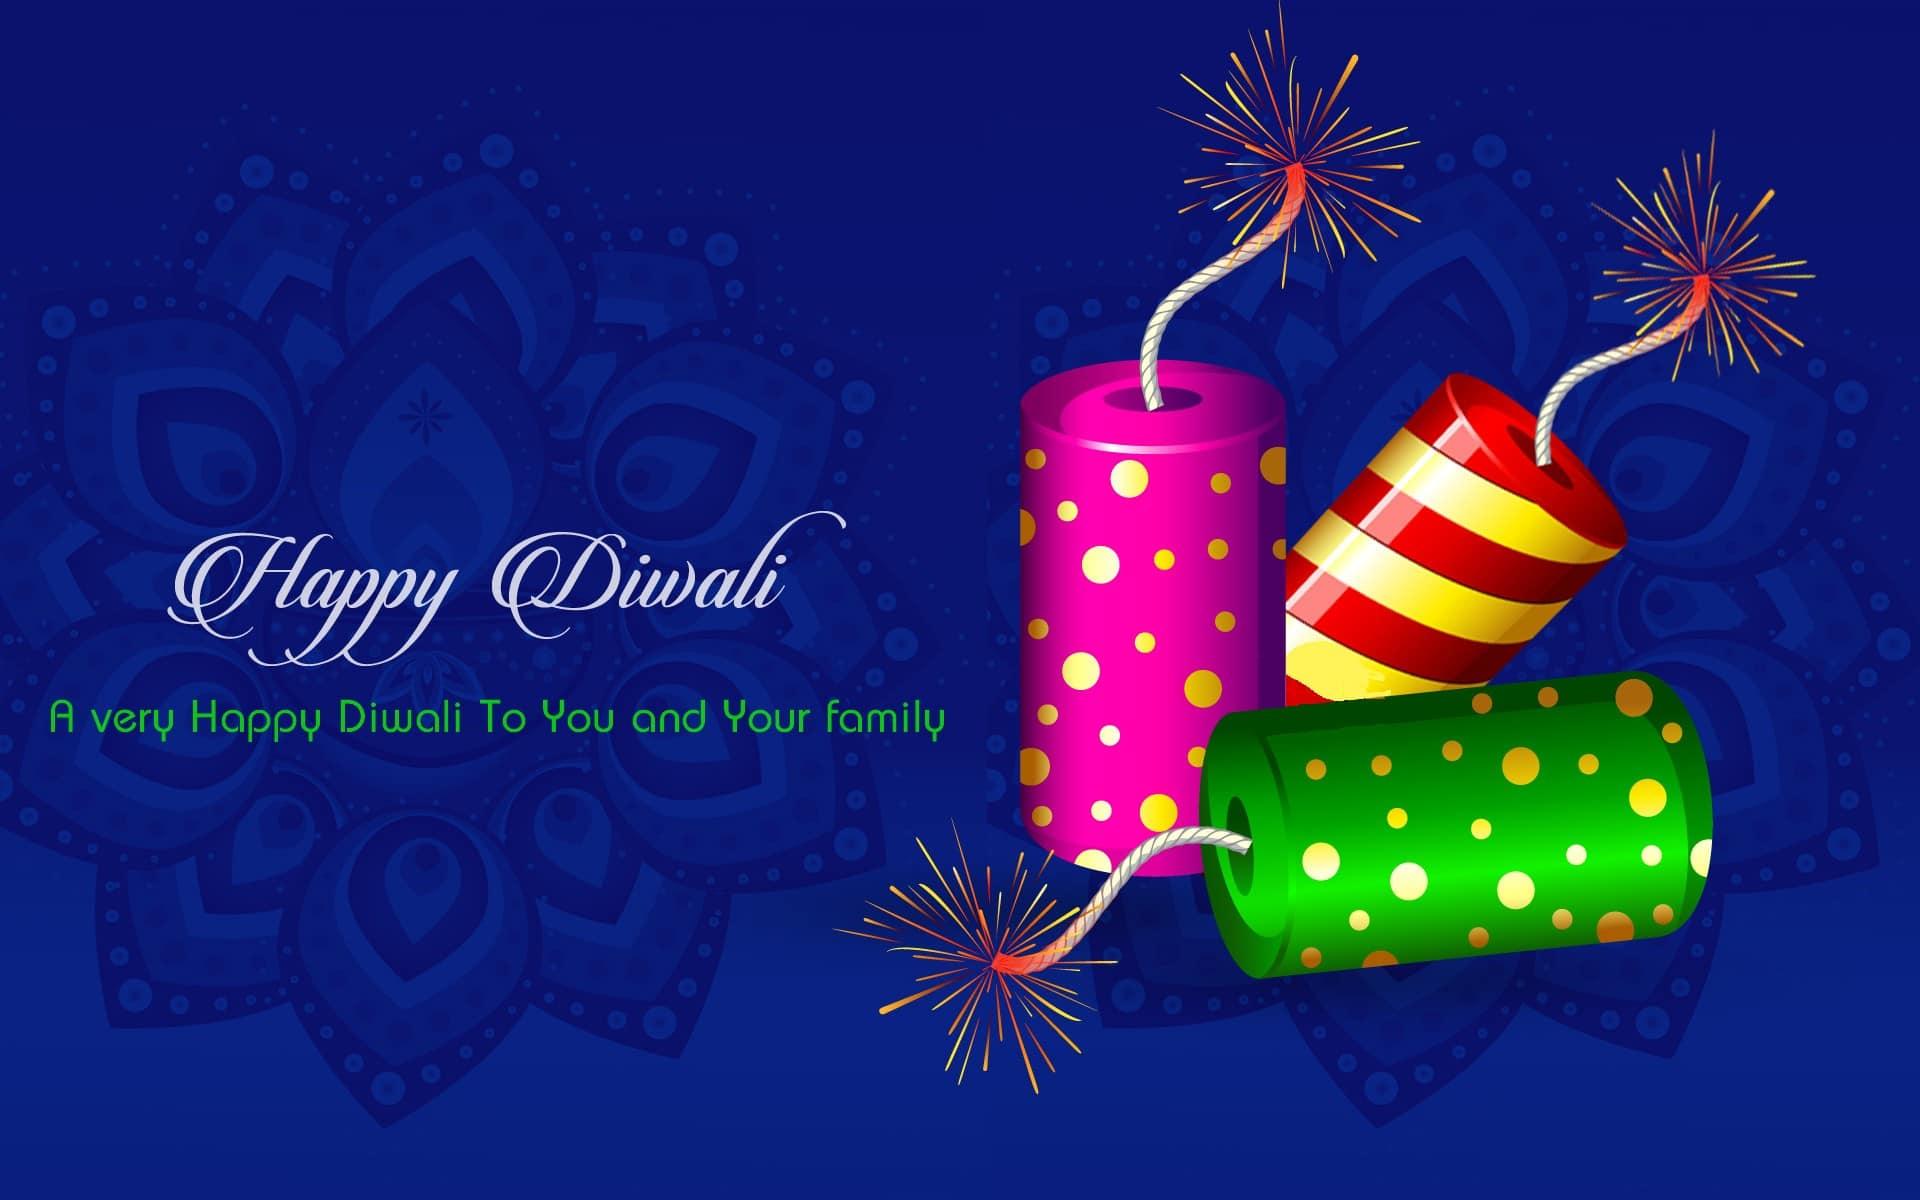 Diwali Cracker Wishes